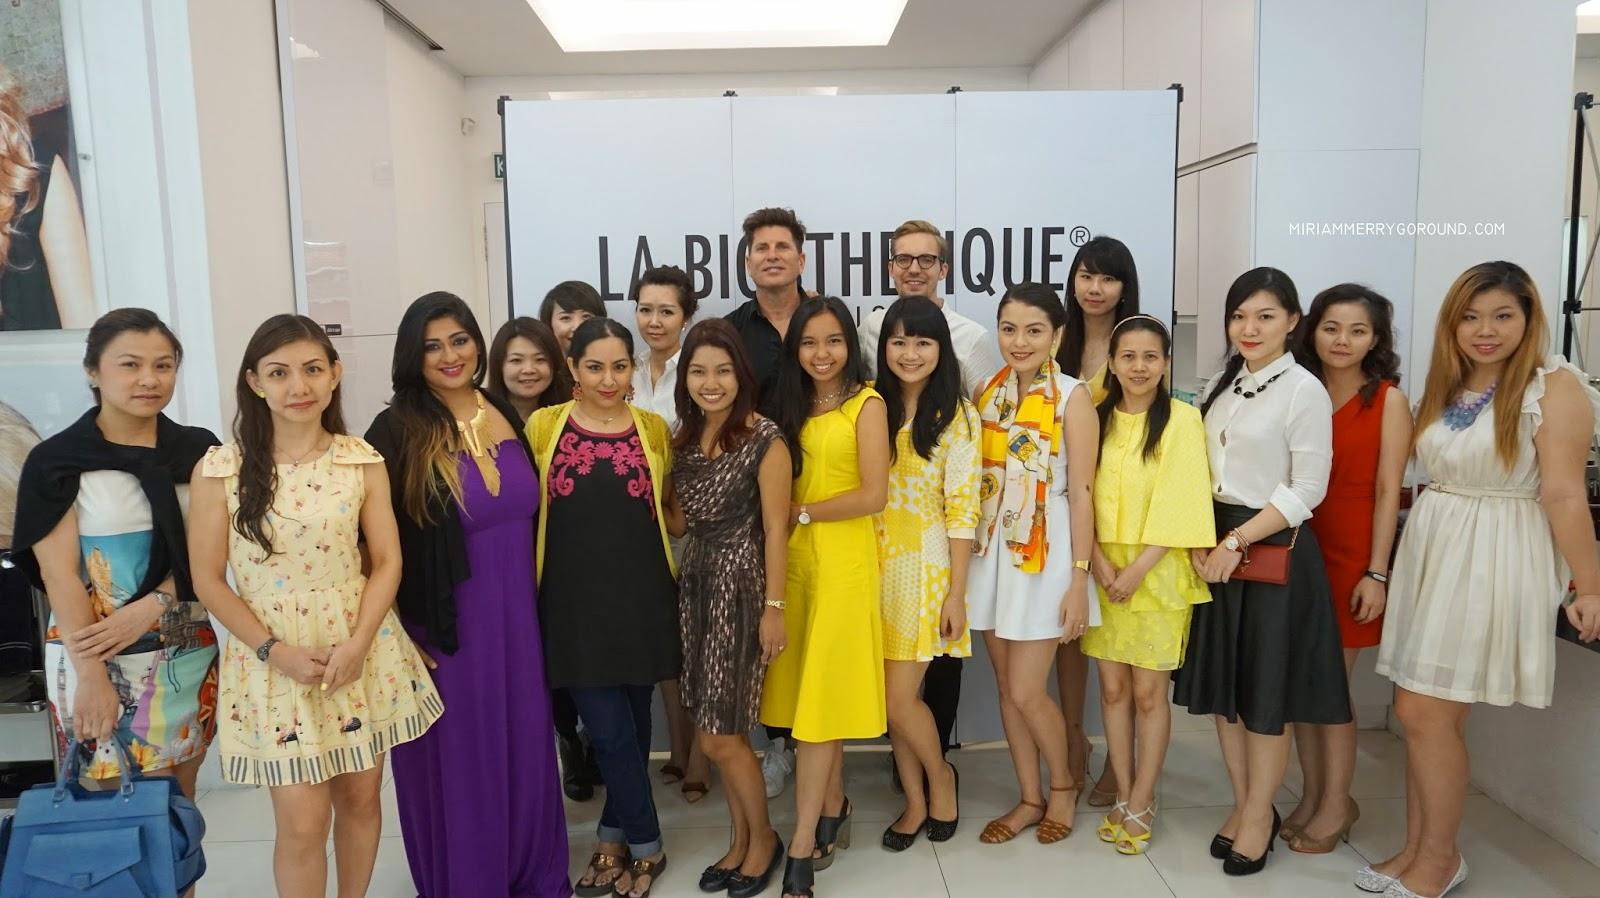 Top salon brand and experience with la biosthetique - La biosthetique salon ...